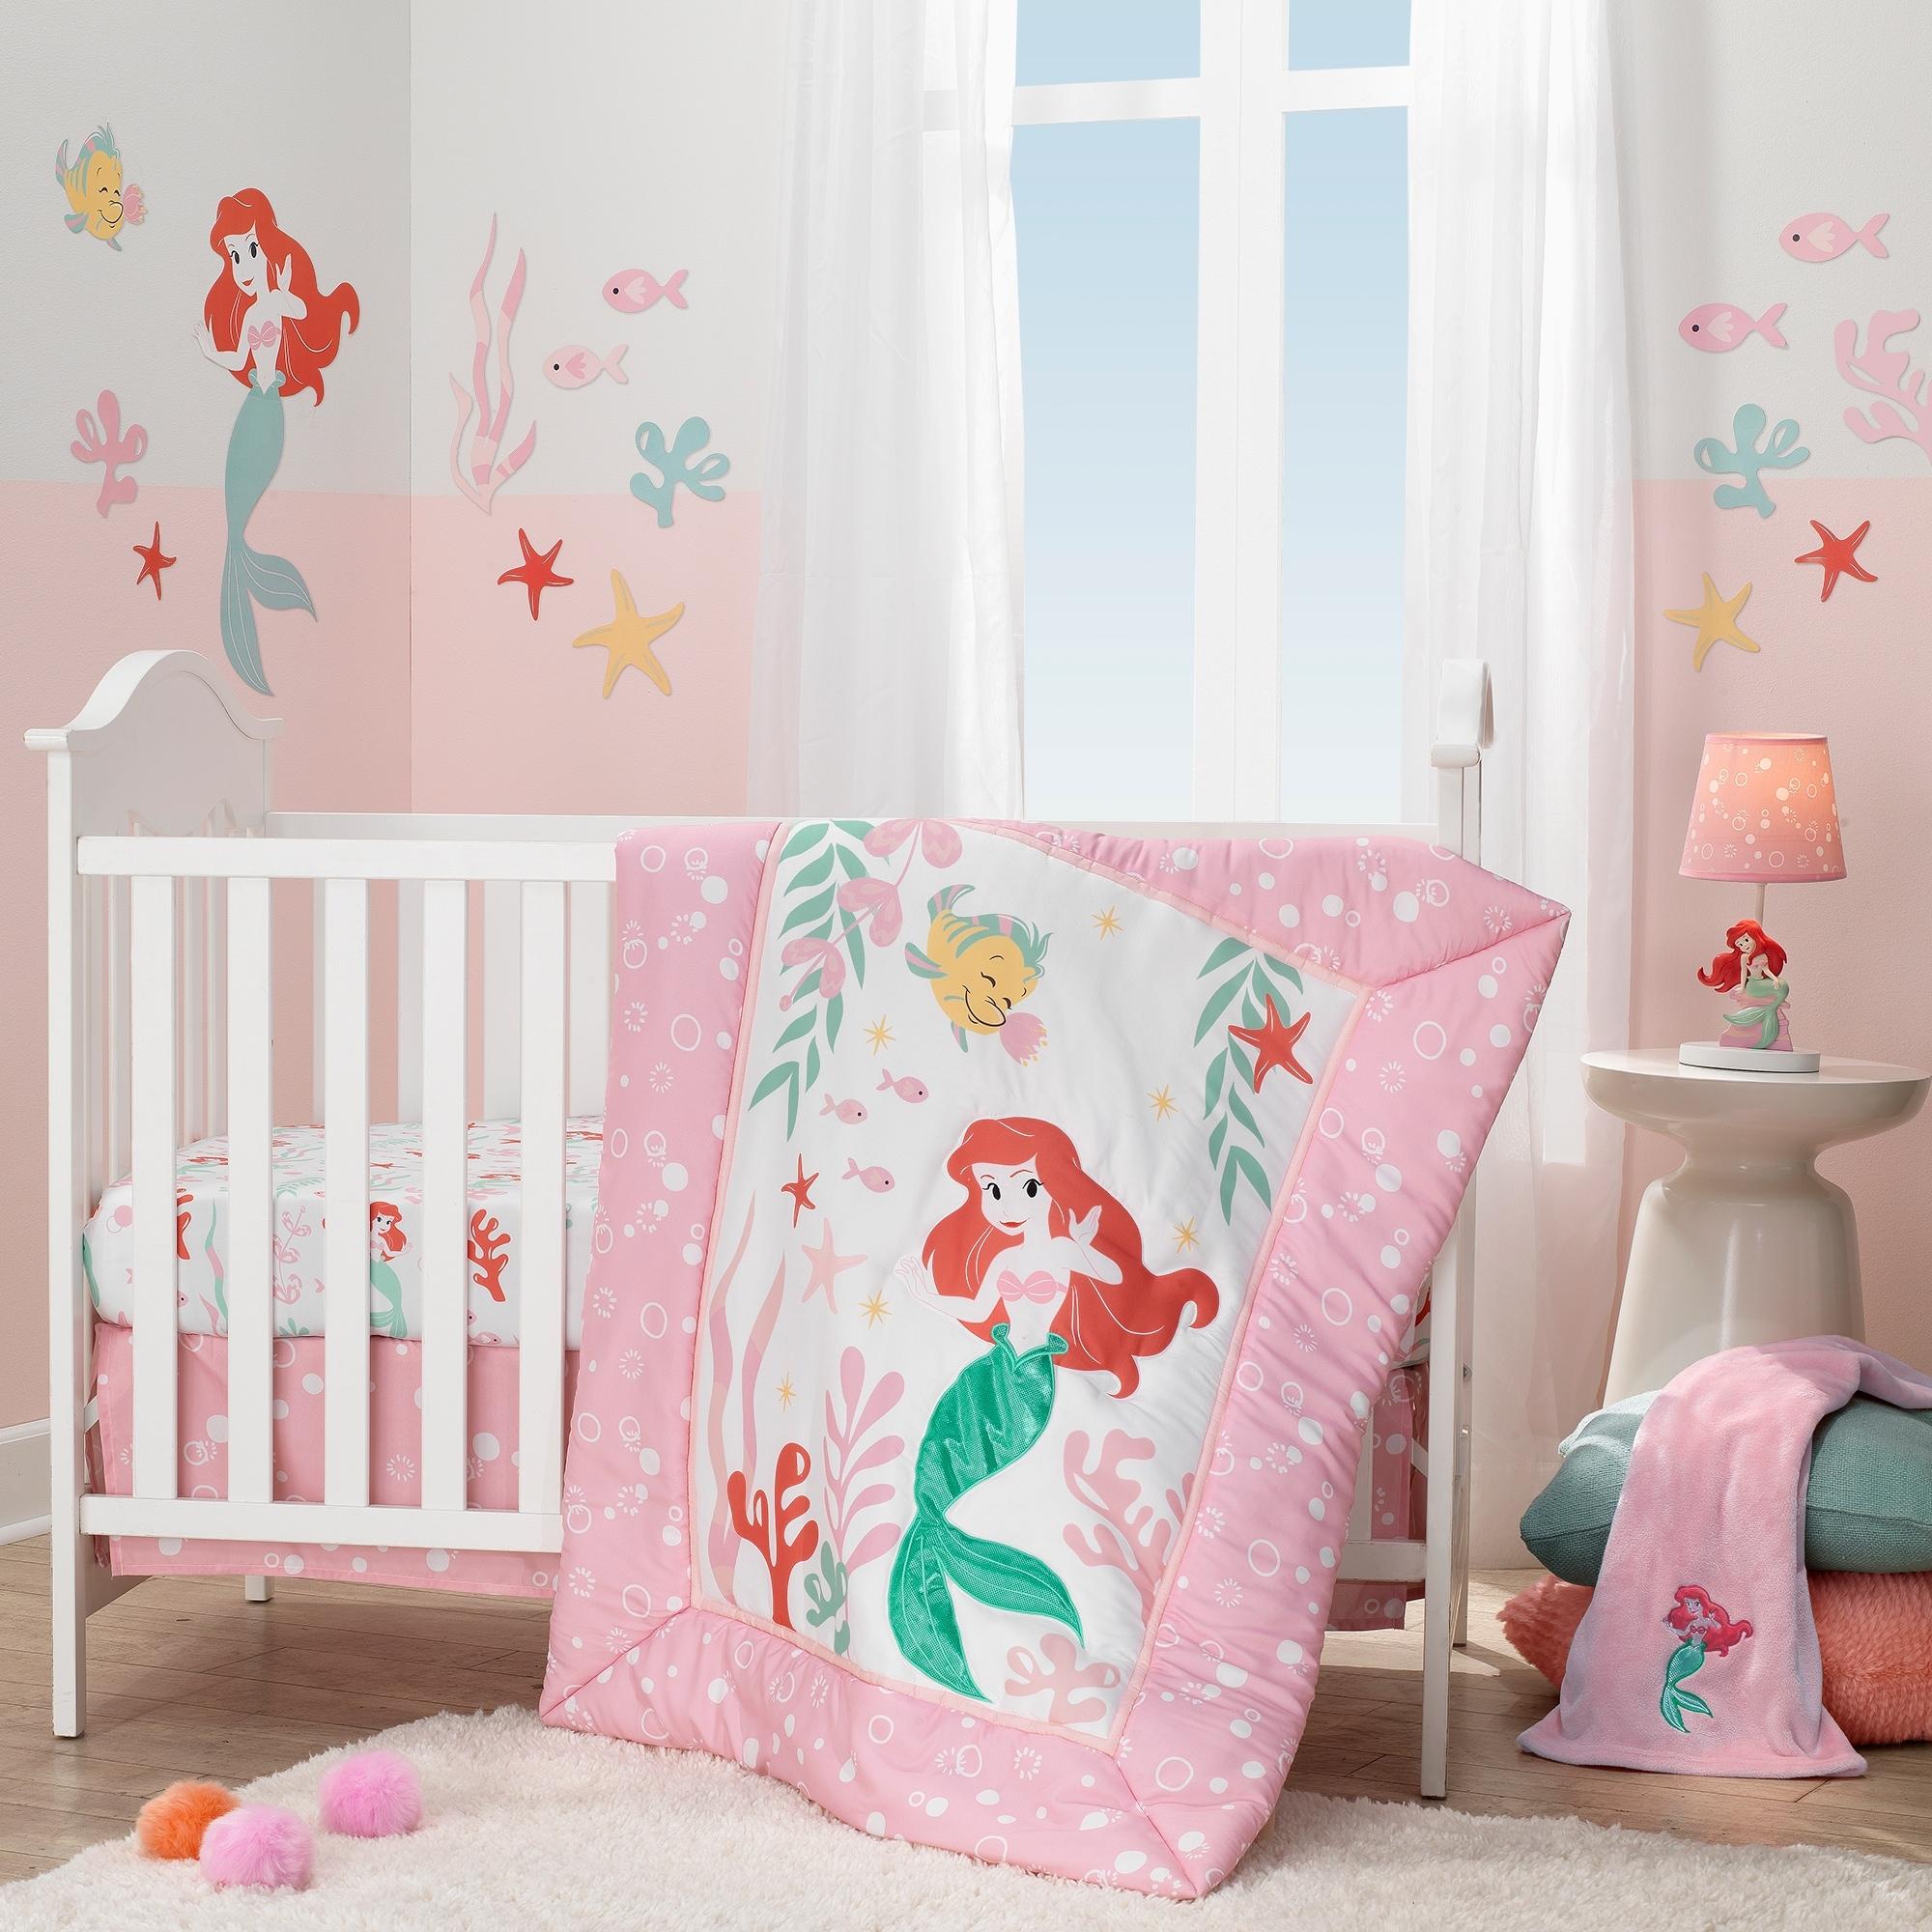 Disney Baby Ariel S Grotto Pink